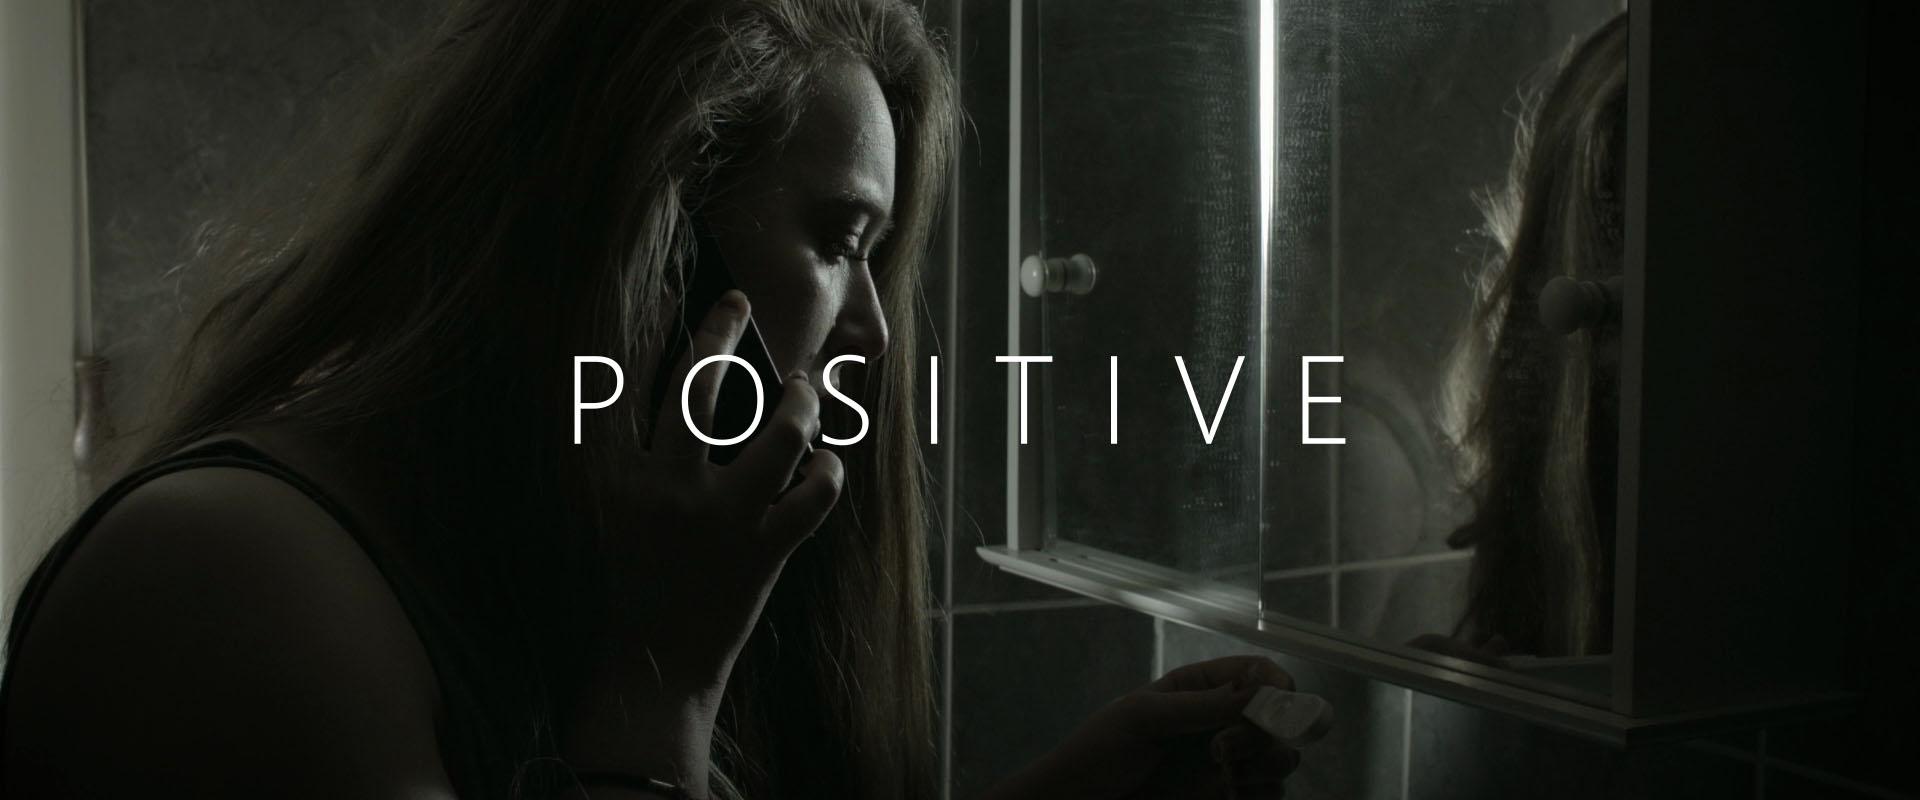 positive shortfilm drama great yarmouth thumbnail